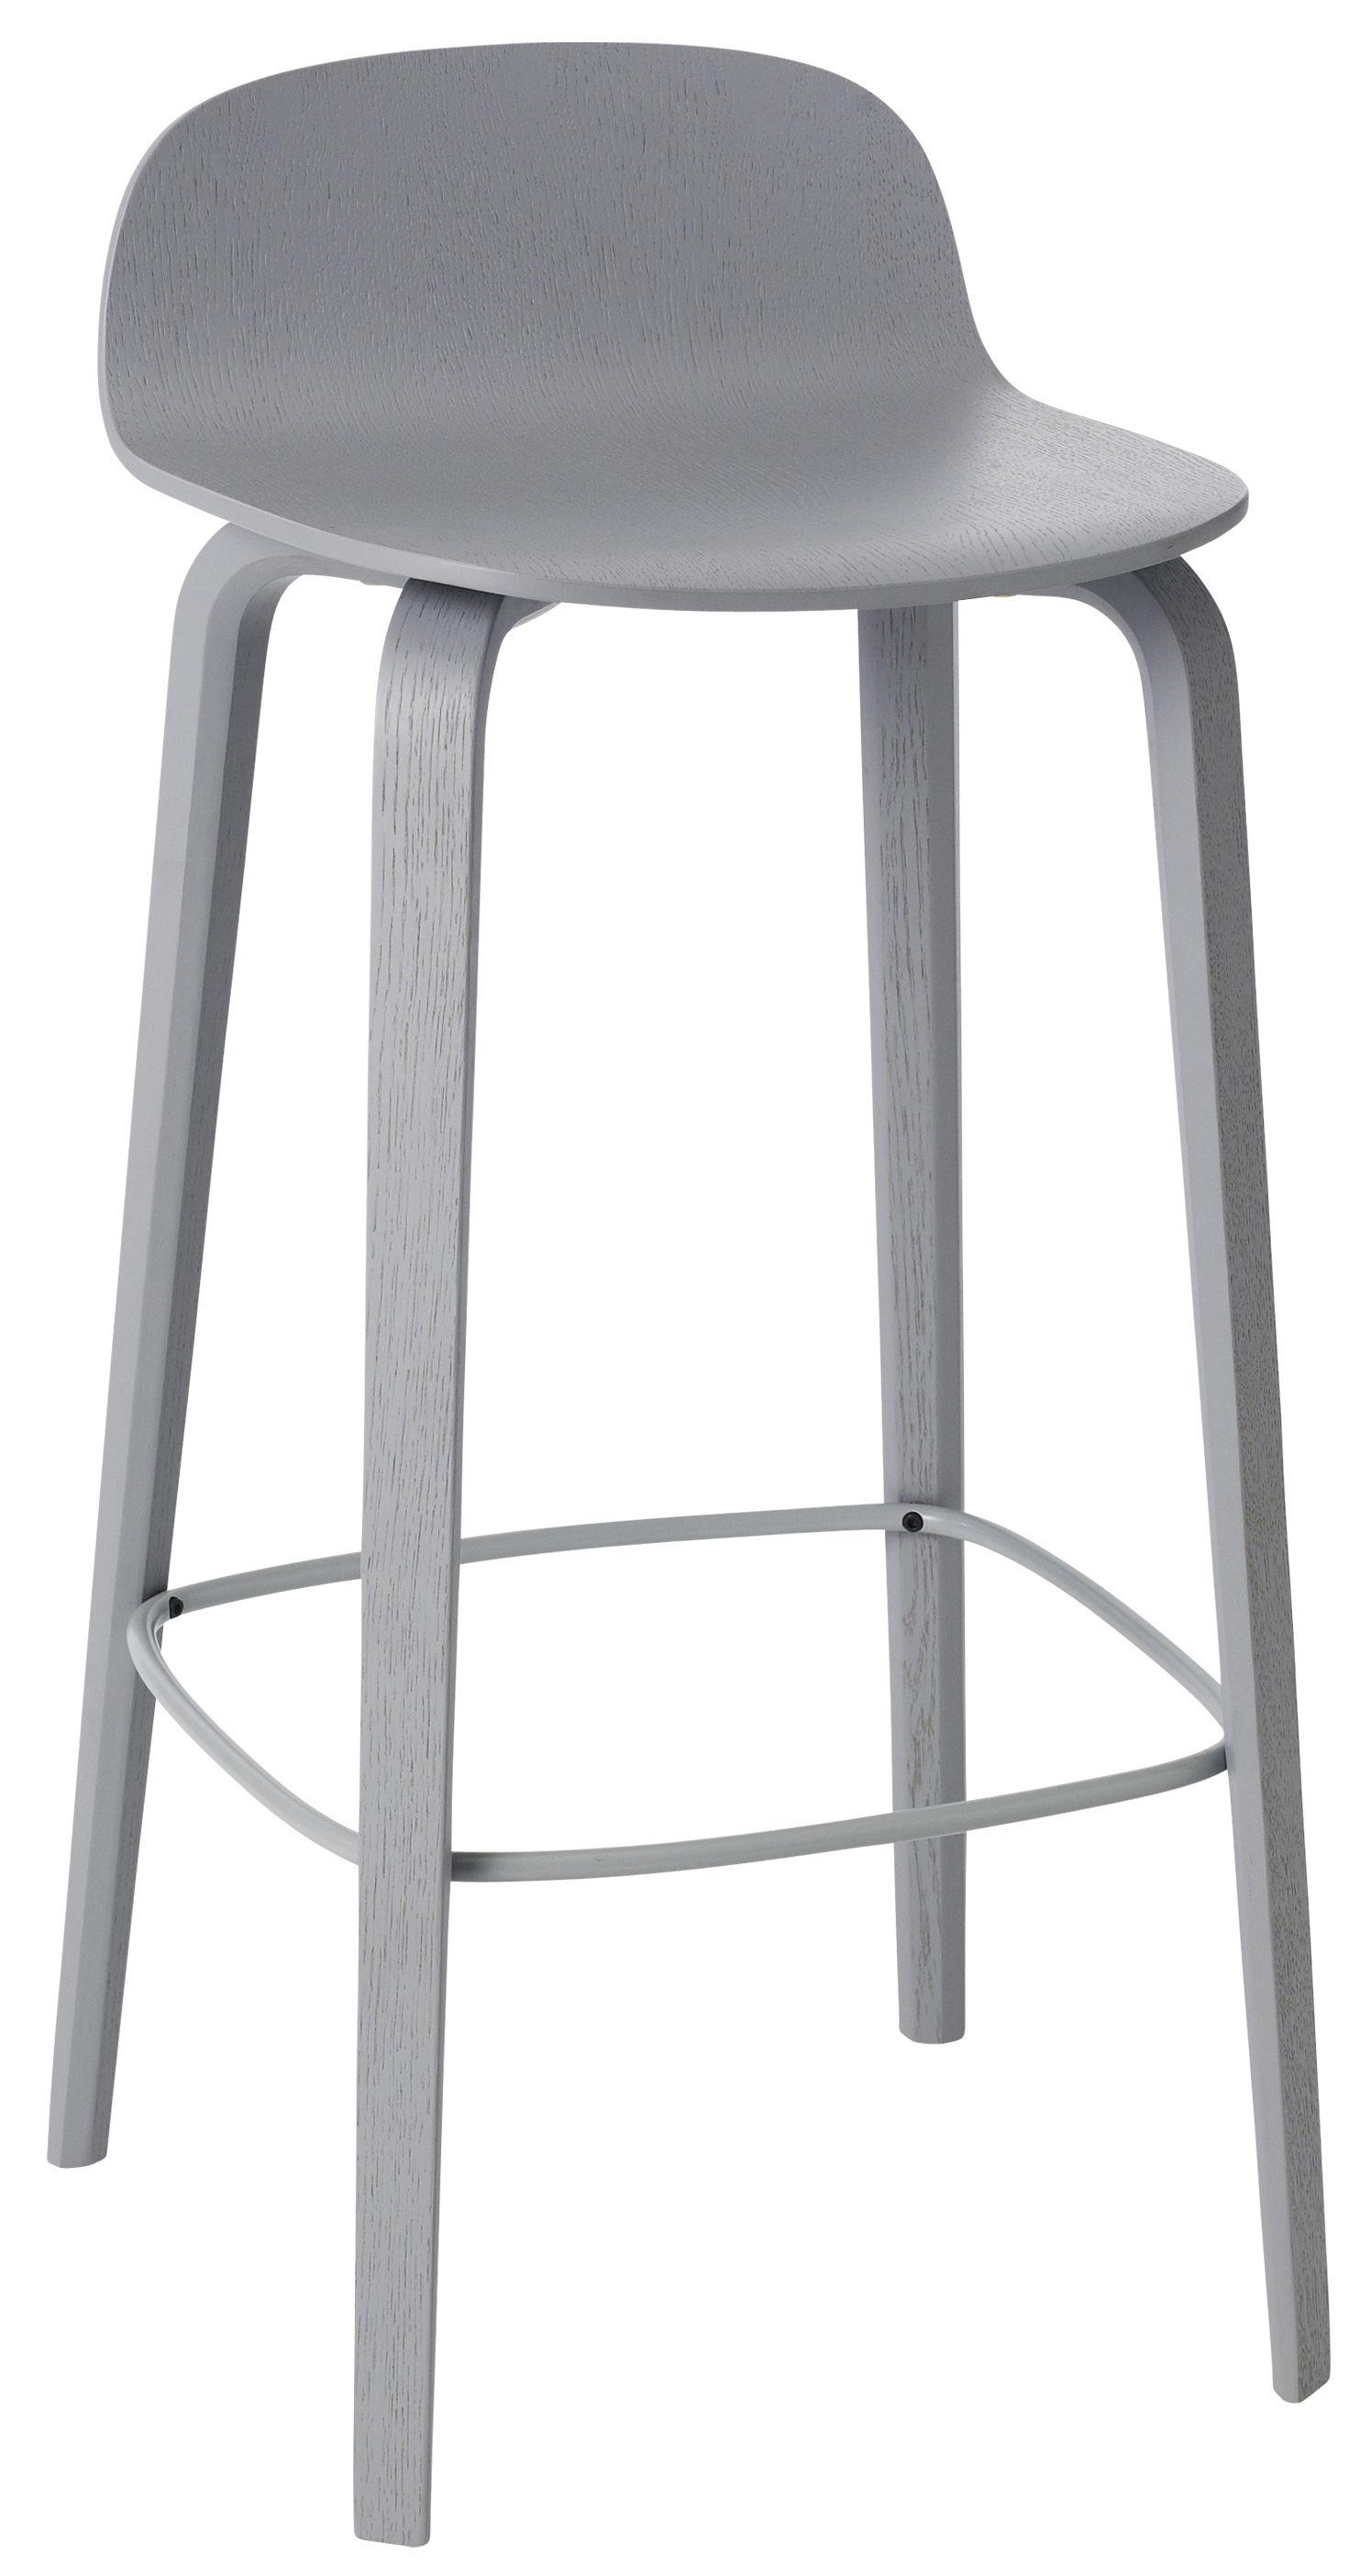 Furniture - Bar Stools - Visu Bar stool - Wood - H 75cm by Muuto - Grey - Varnished ashwood, Varnished steel